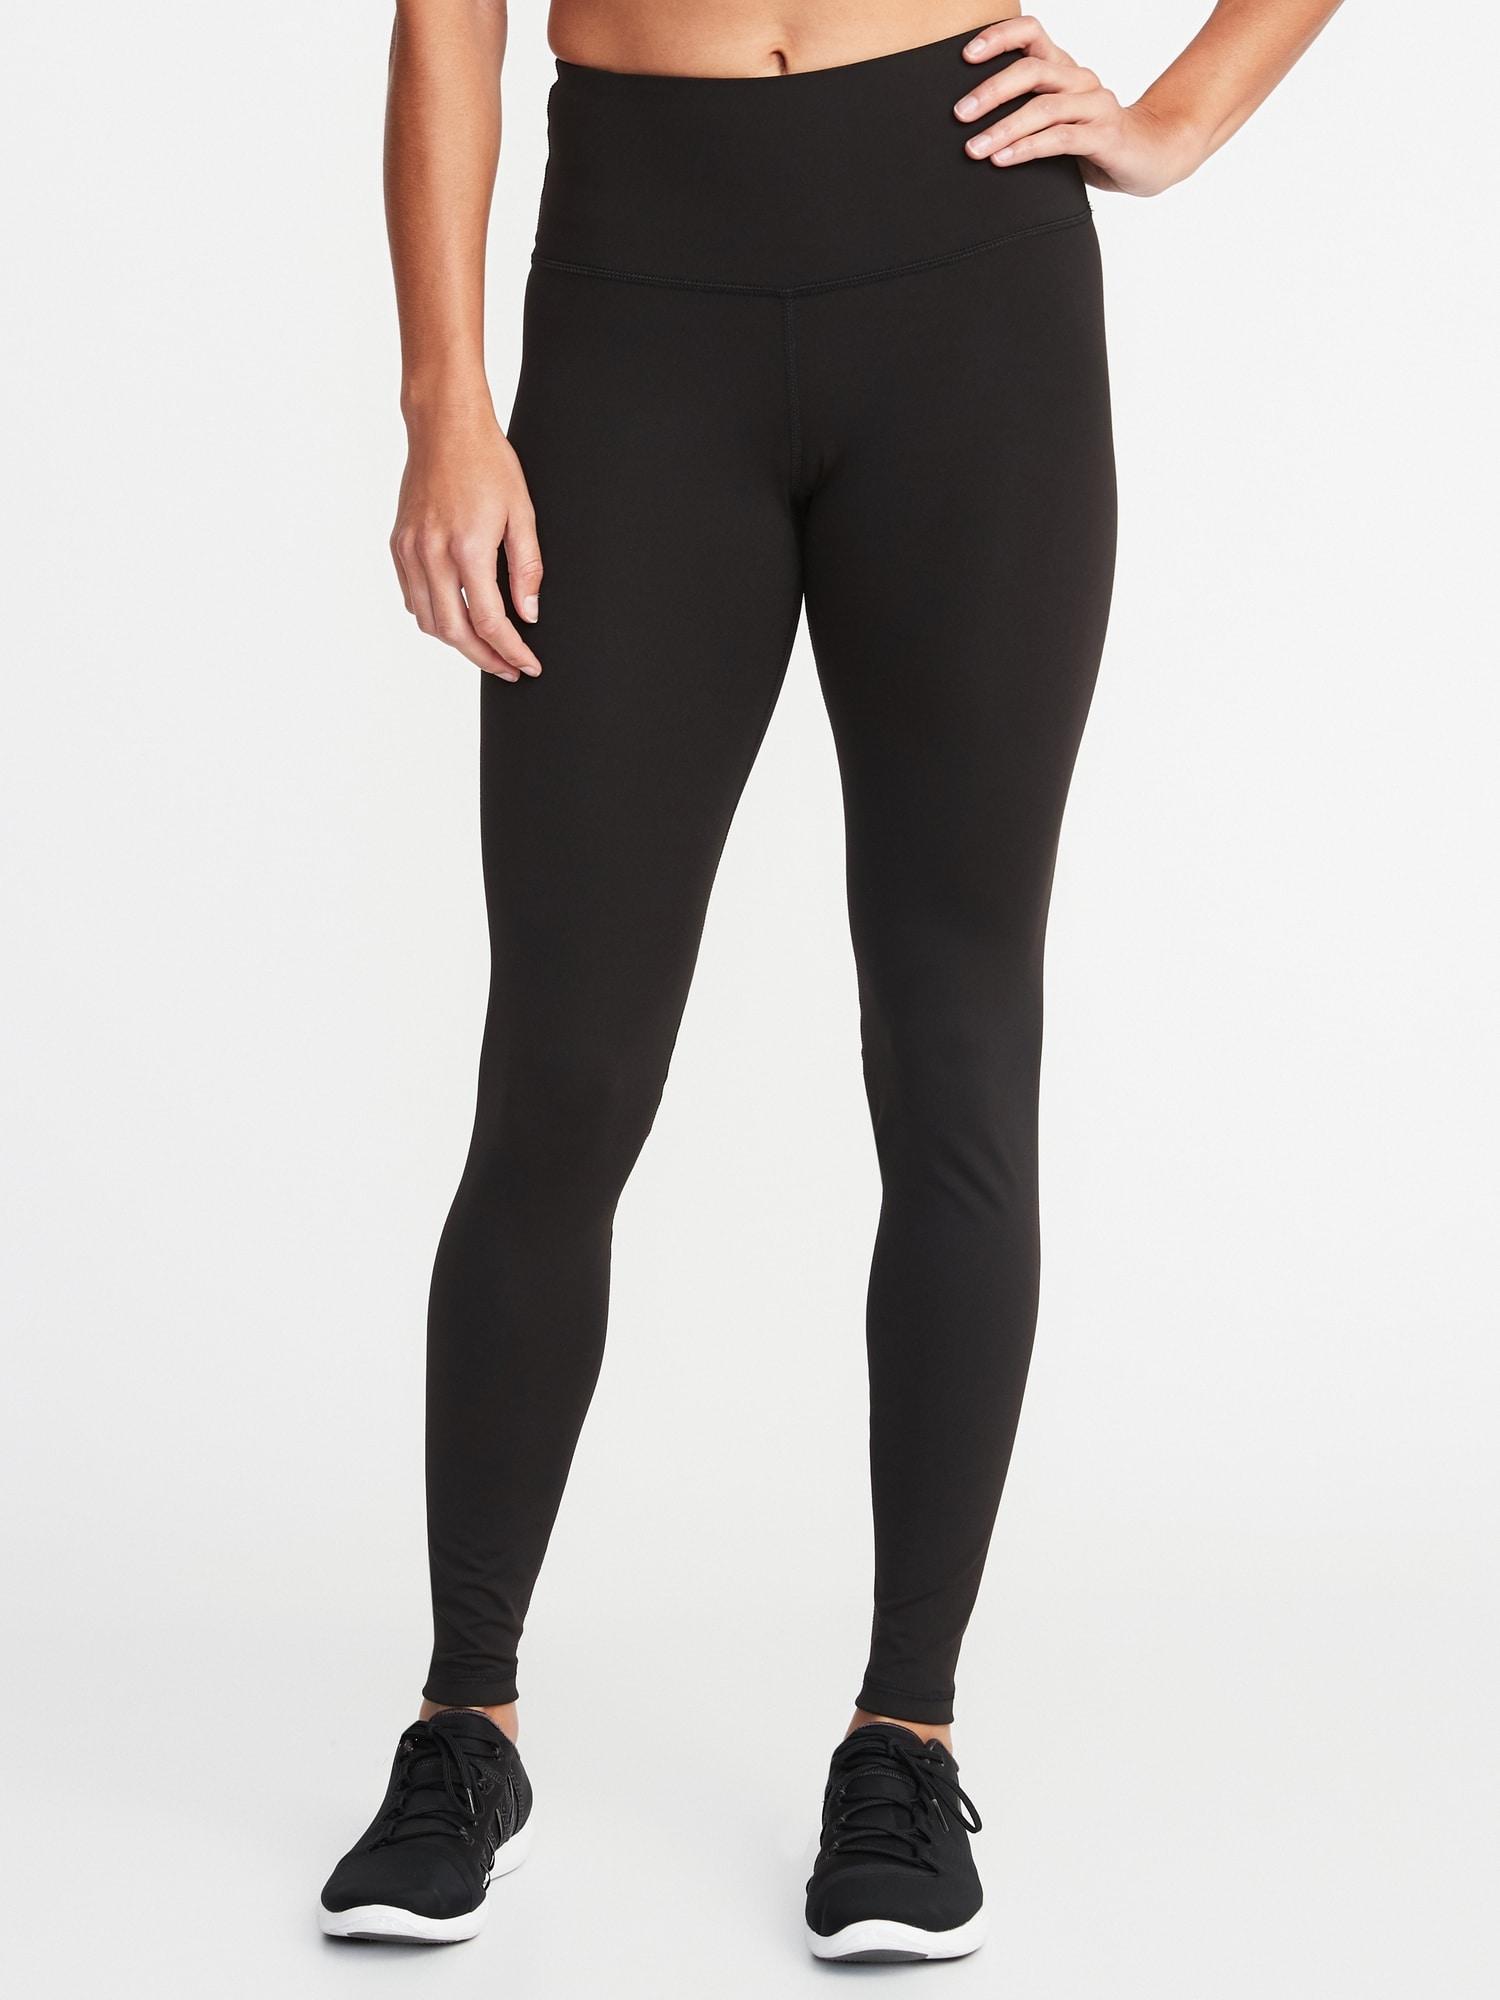 old navy womens black leggings